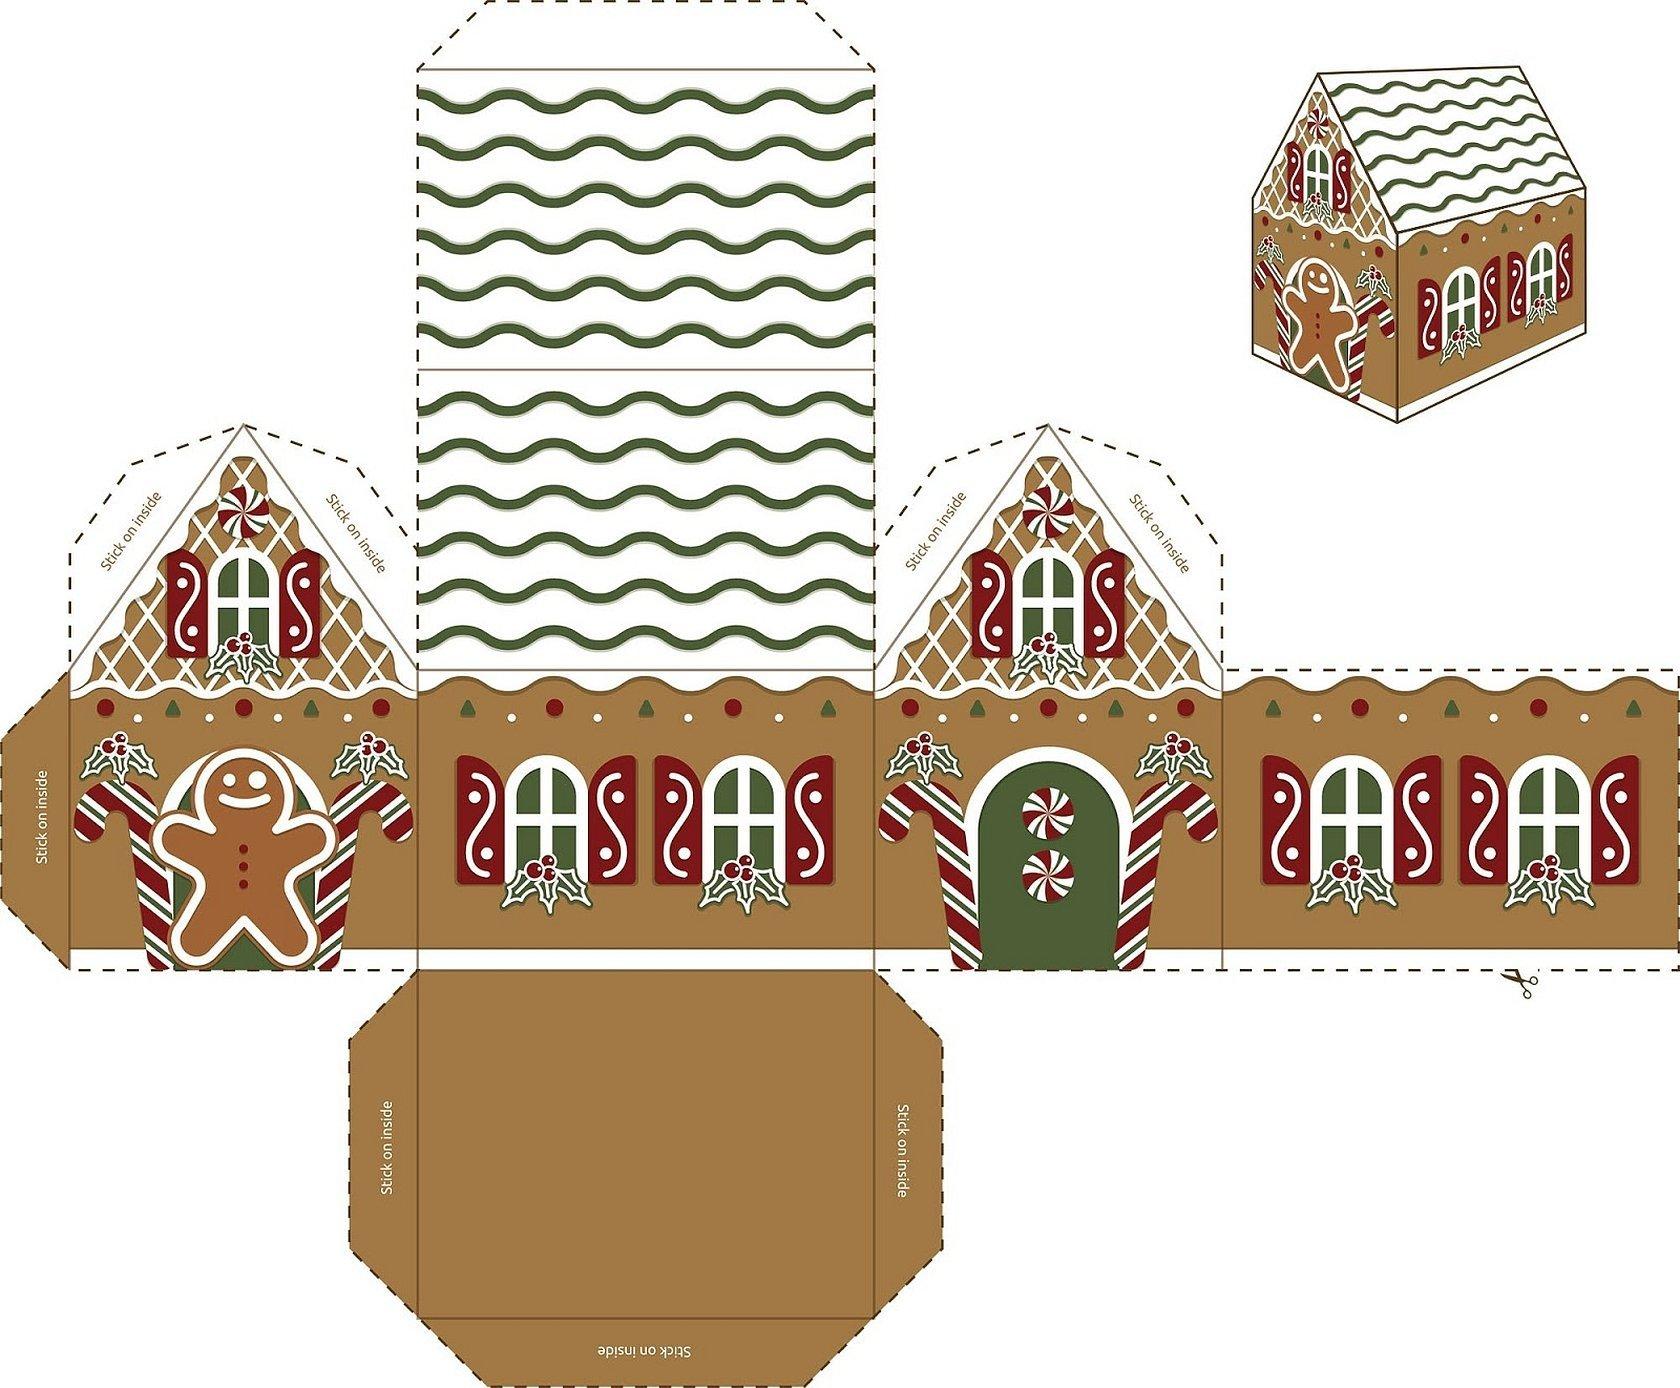 Адвент шаблон бумажный пряничный домик